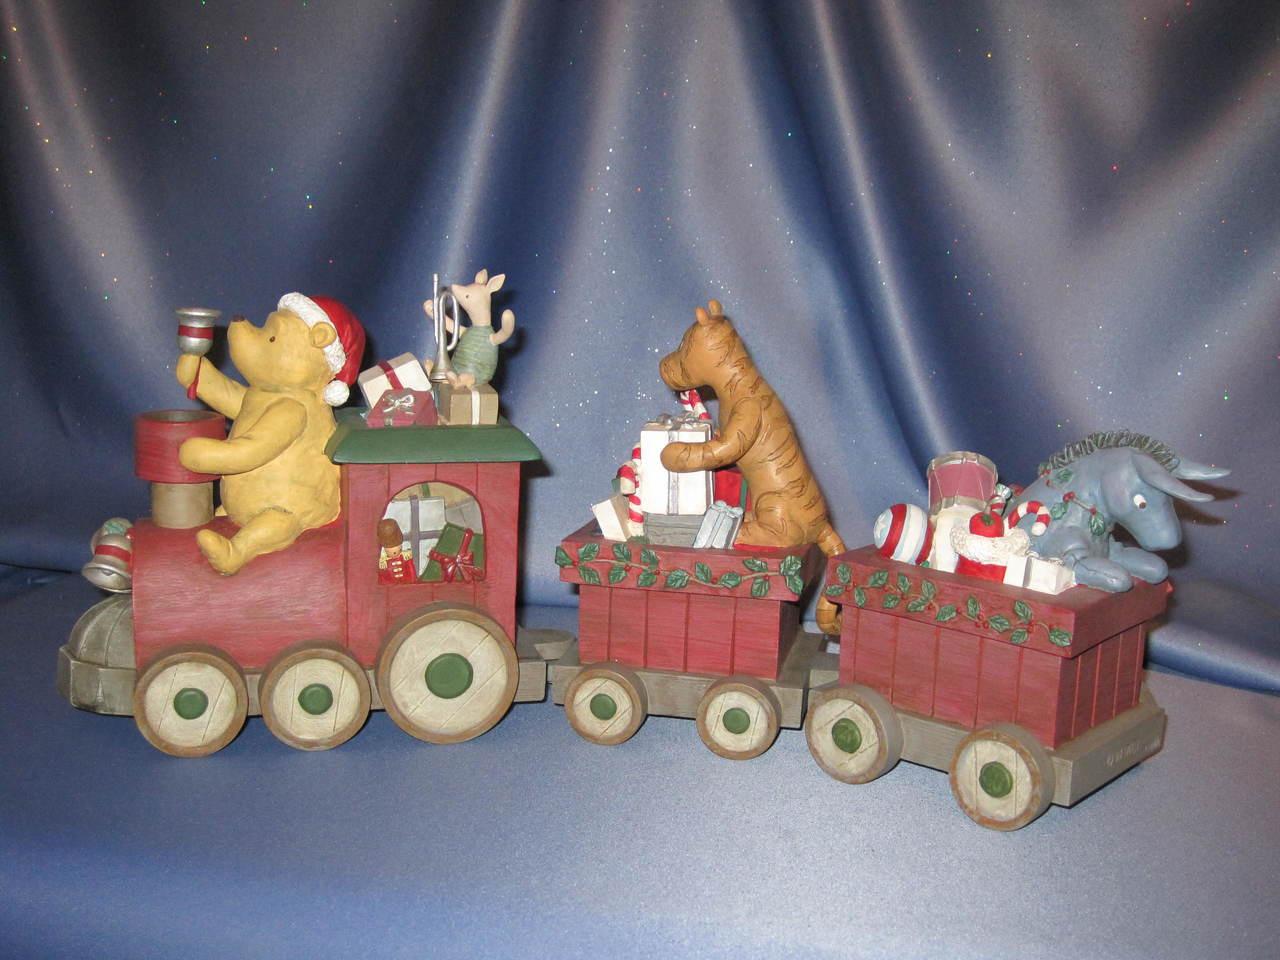 Choo Choo Pooh Centerpiece by Michel & Company - Disney